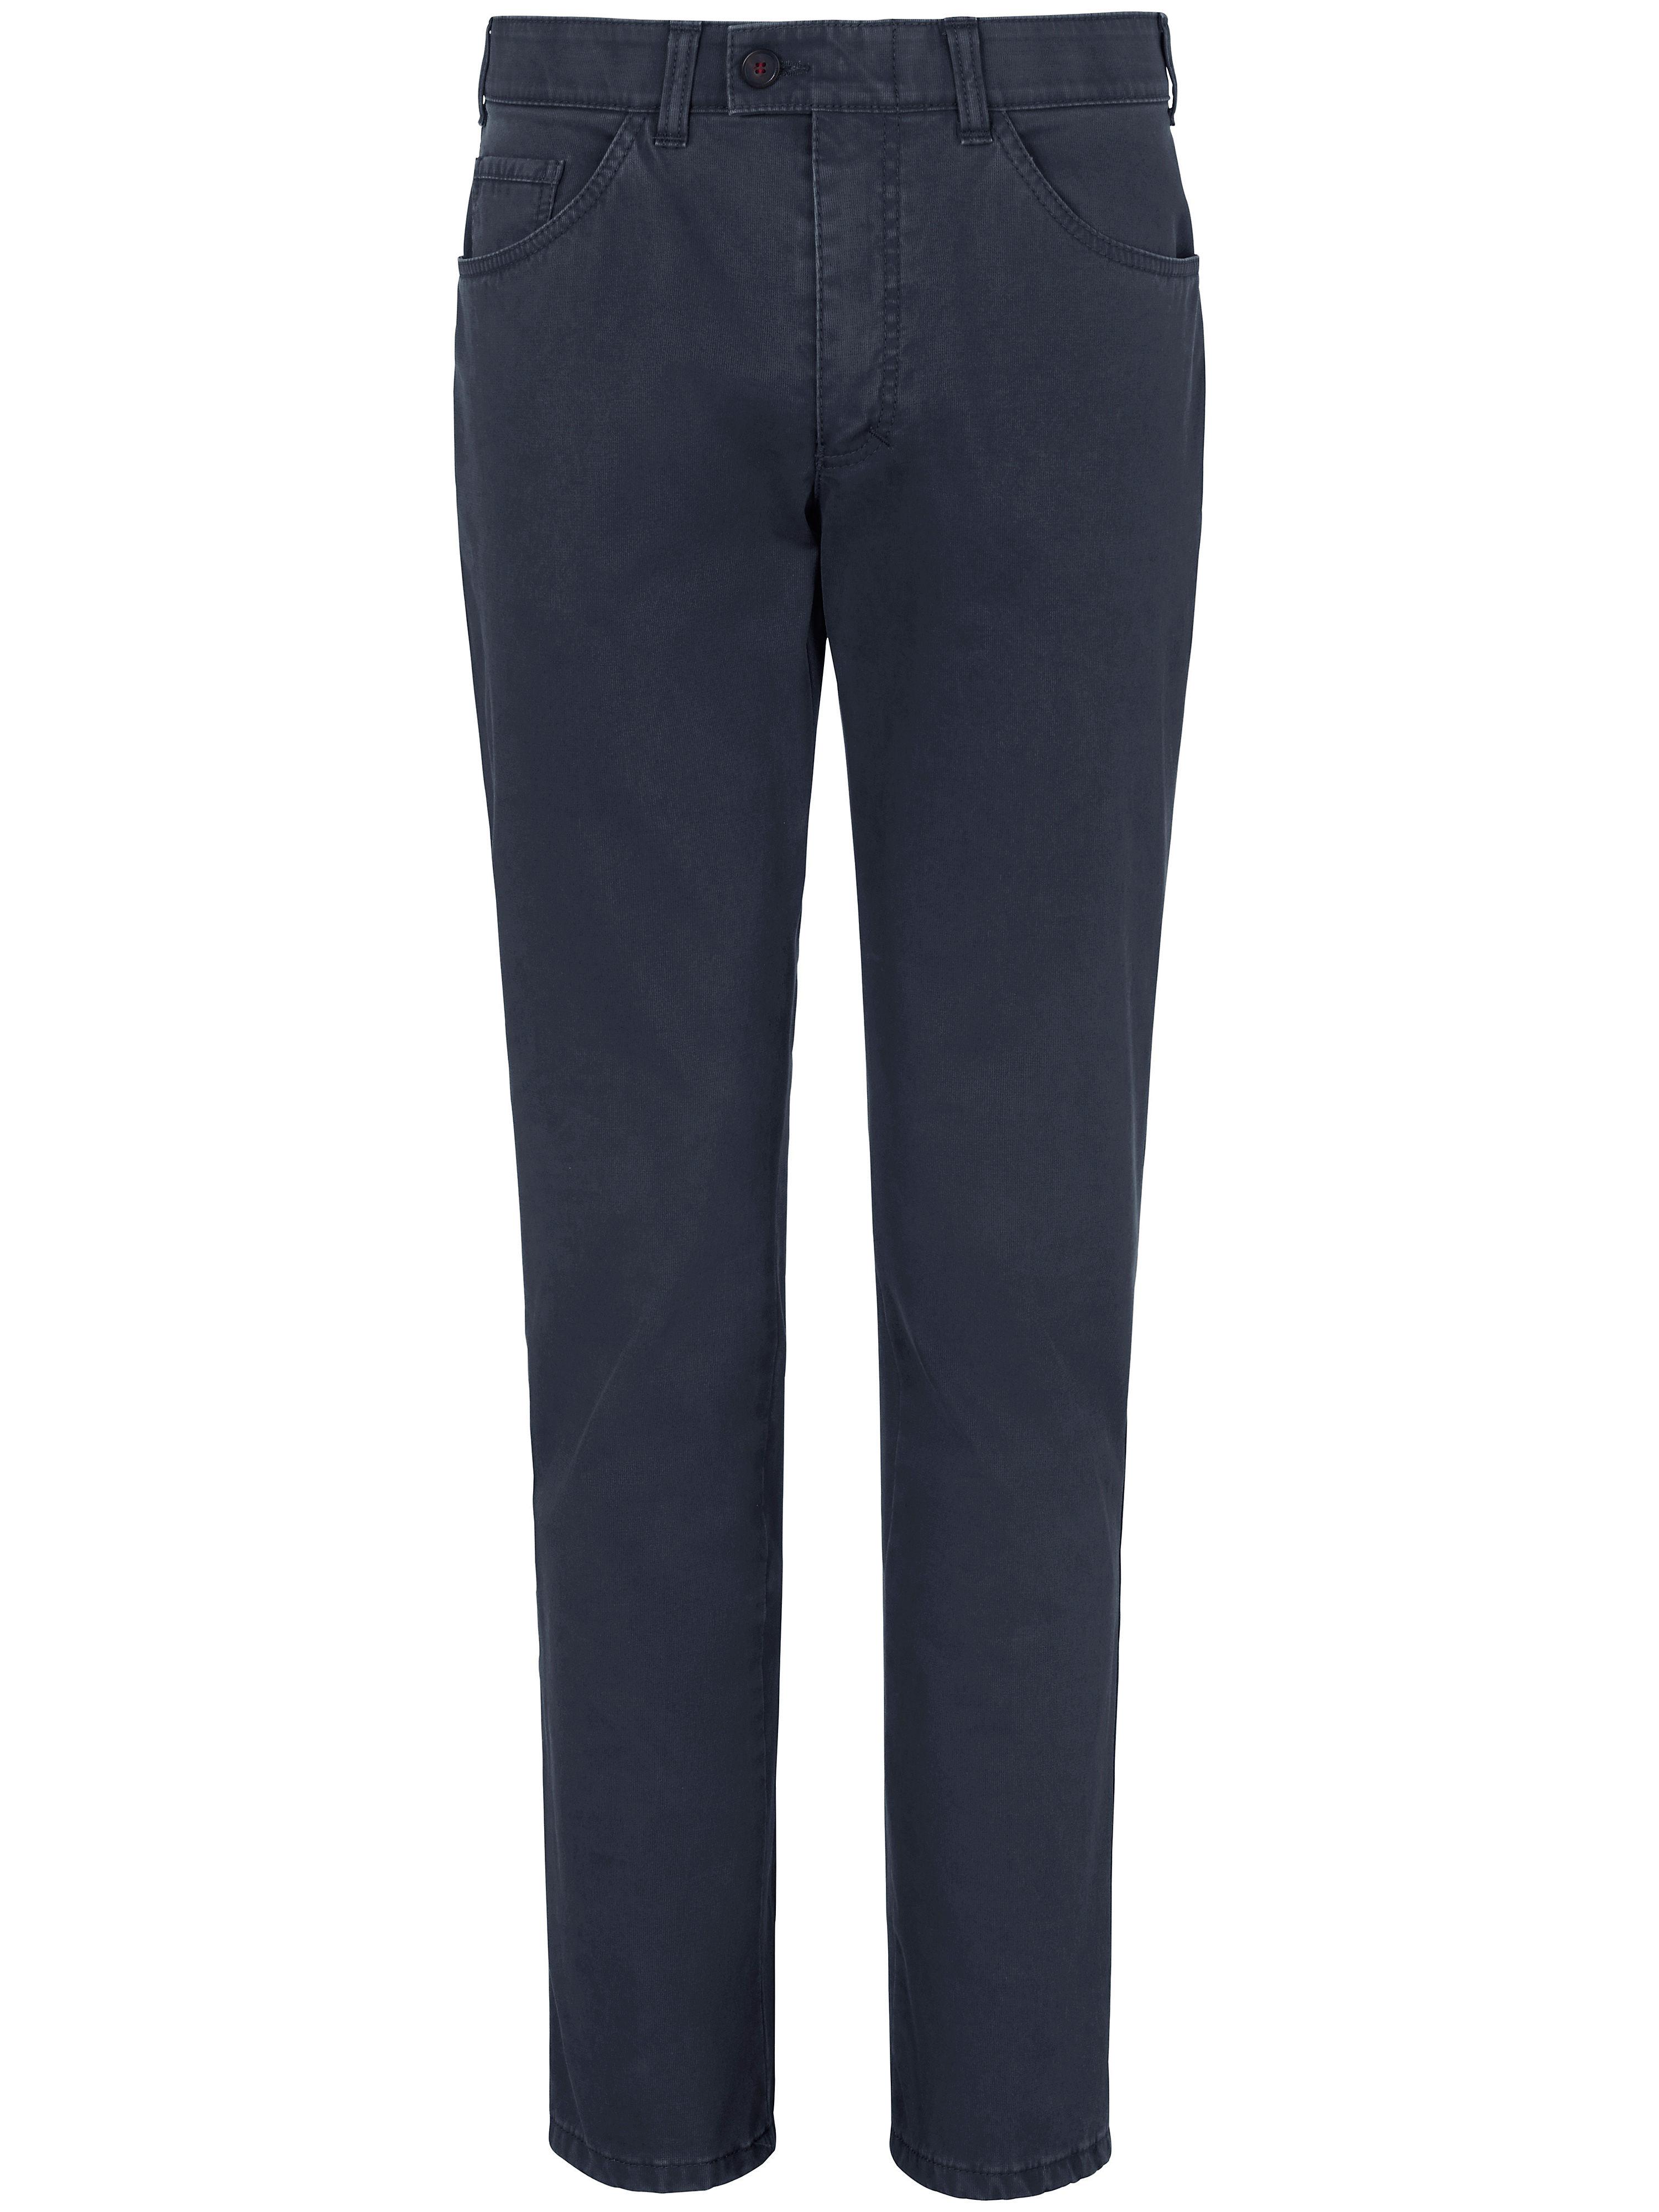 Le pantalon chaud Modèle Keno  CLUB OF COMFORT bleu